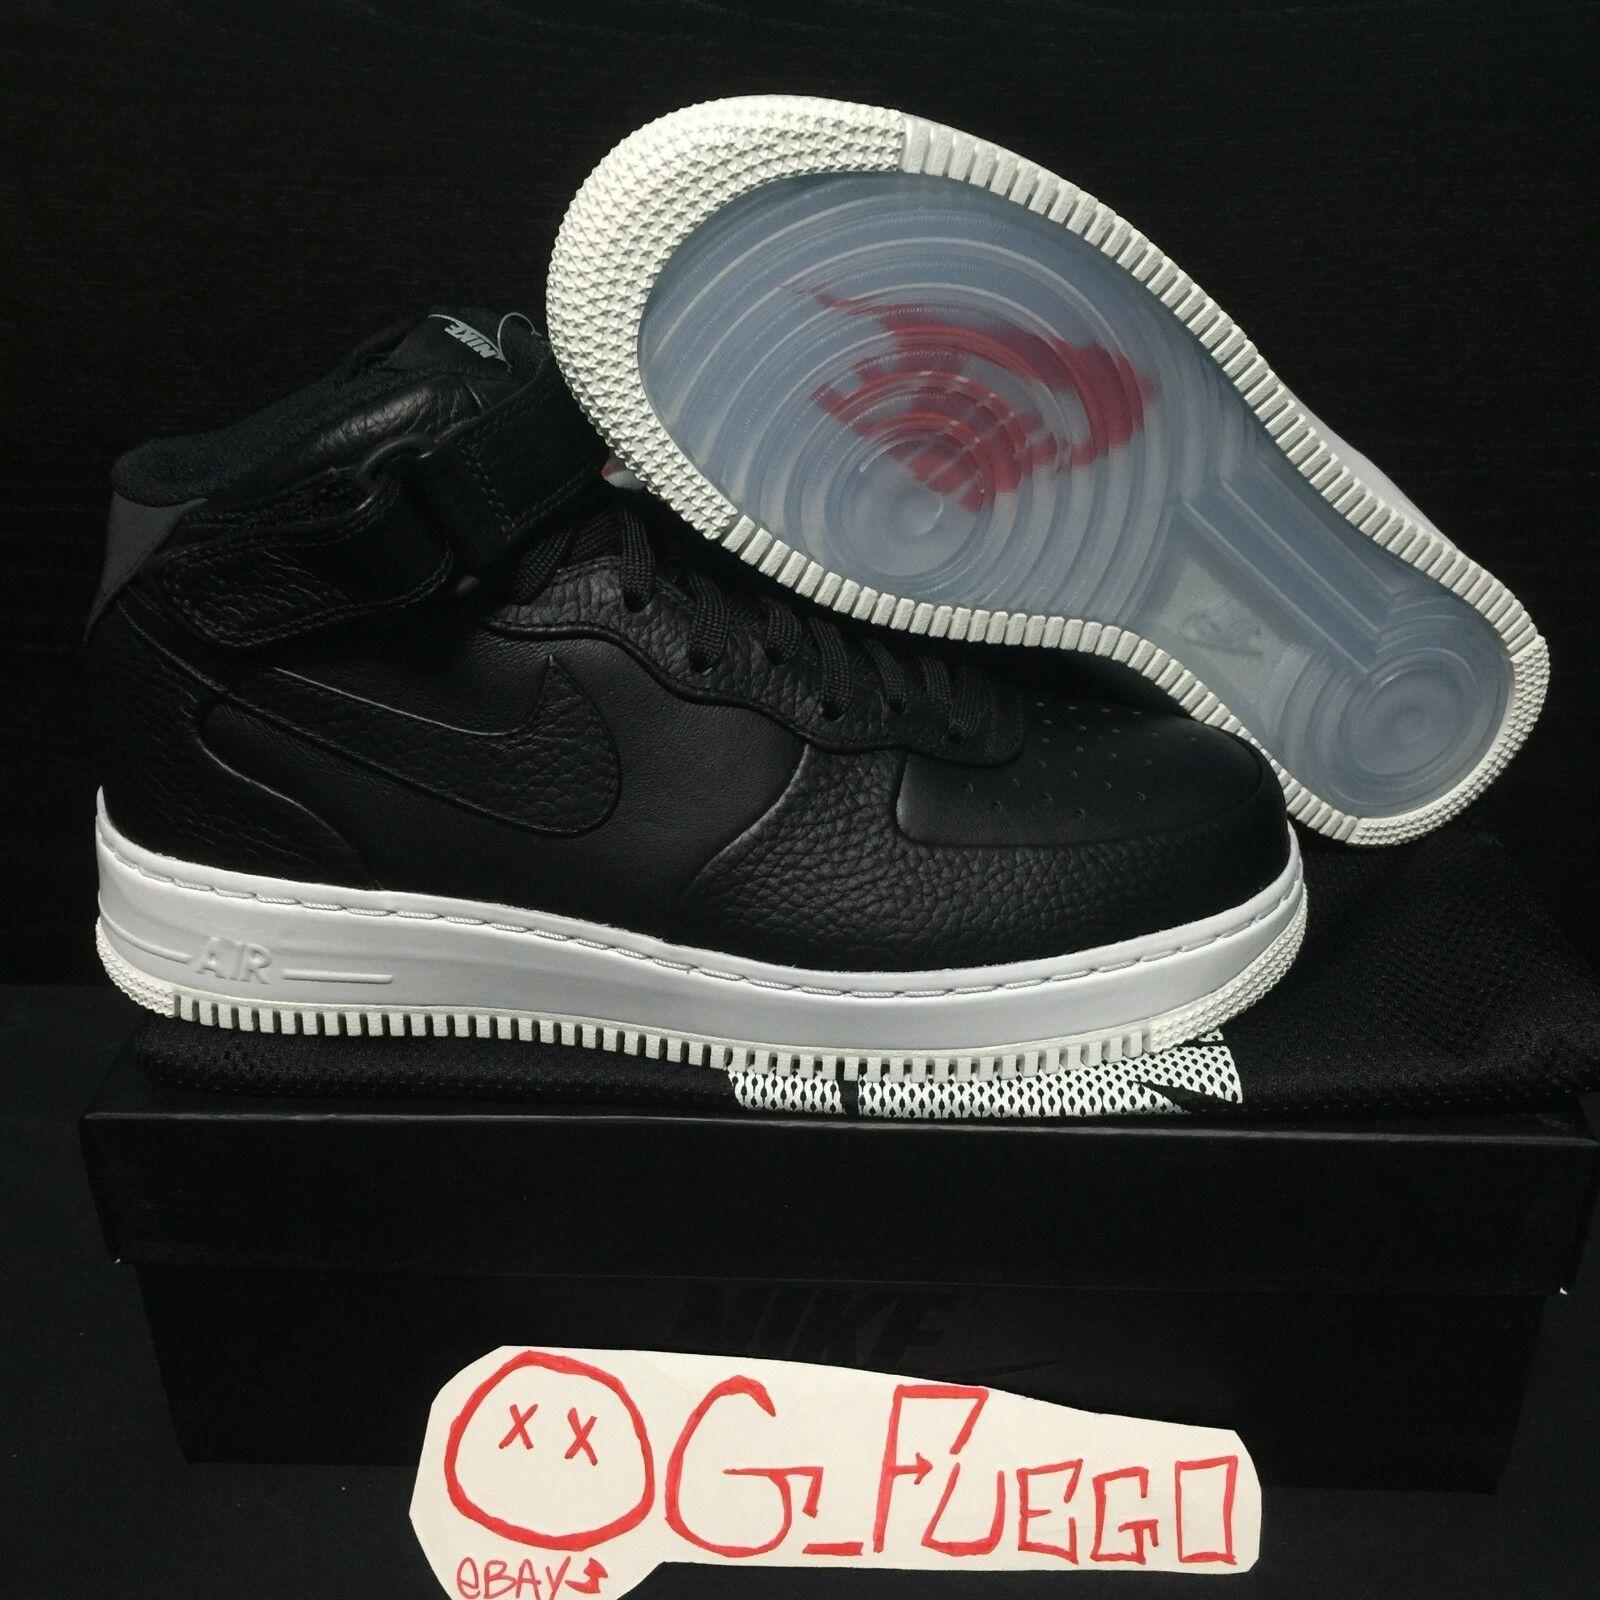 Nike Air Force 1 MID CMFT SP 718153 008 NikeLab Black Men's Size 9